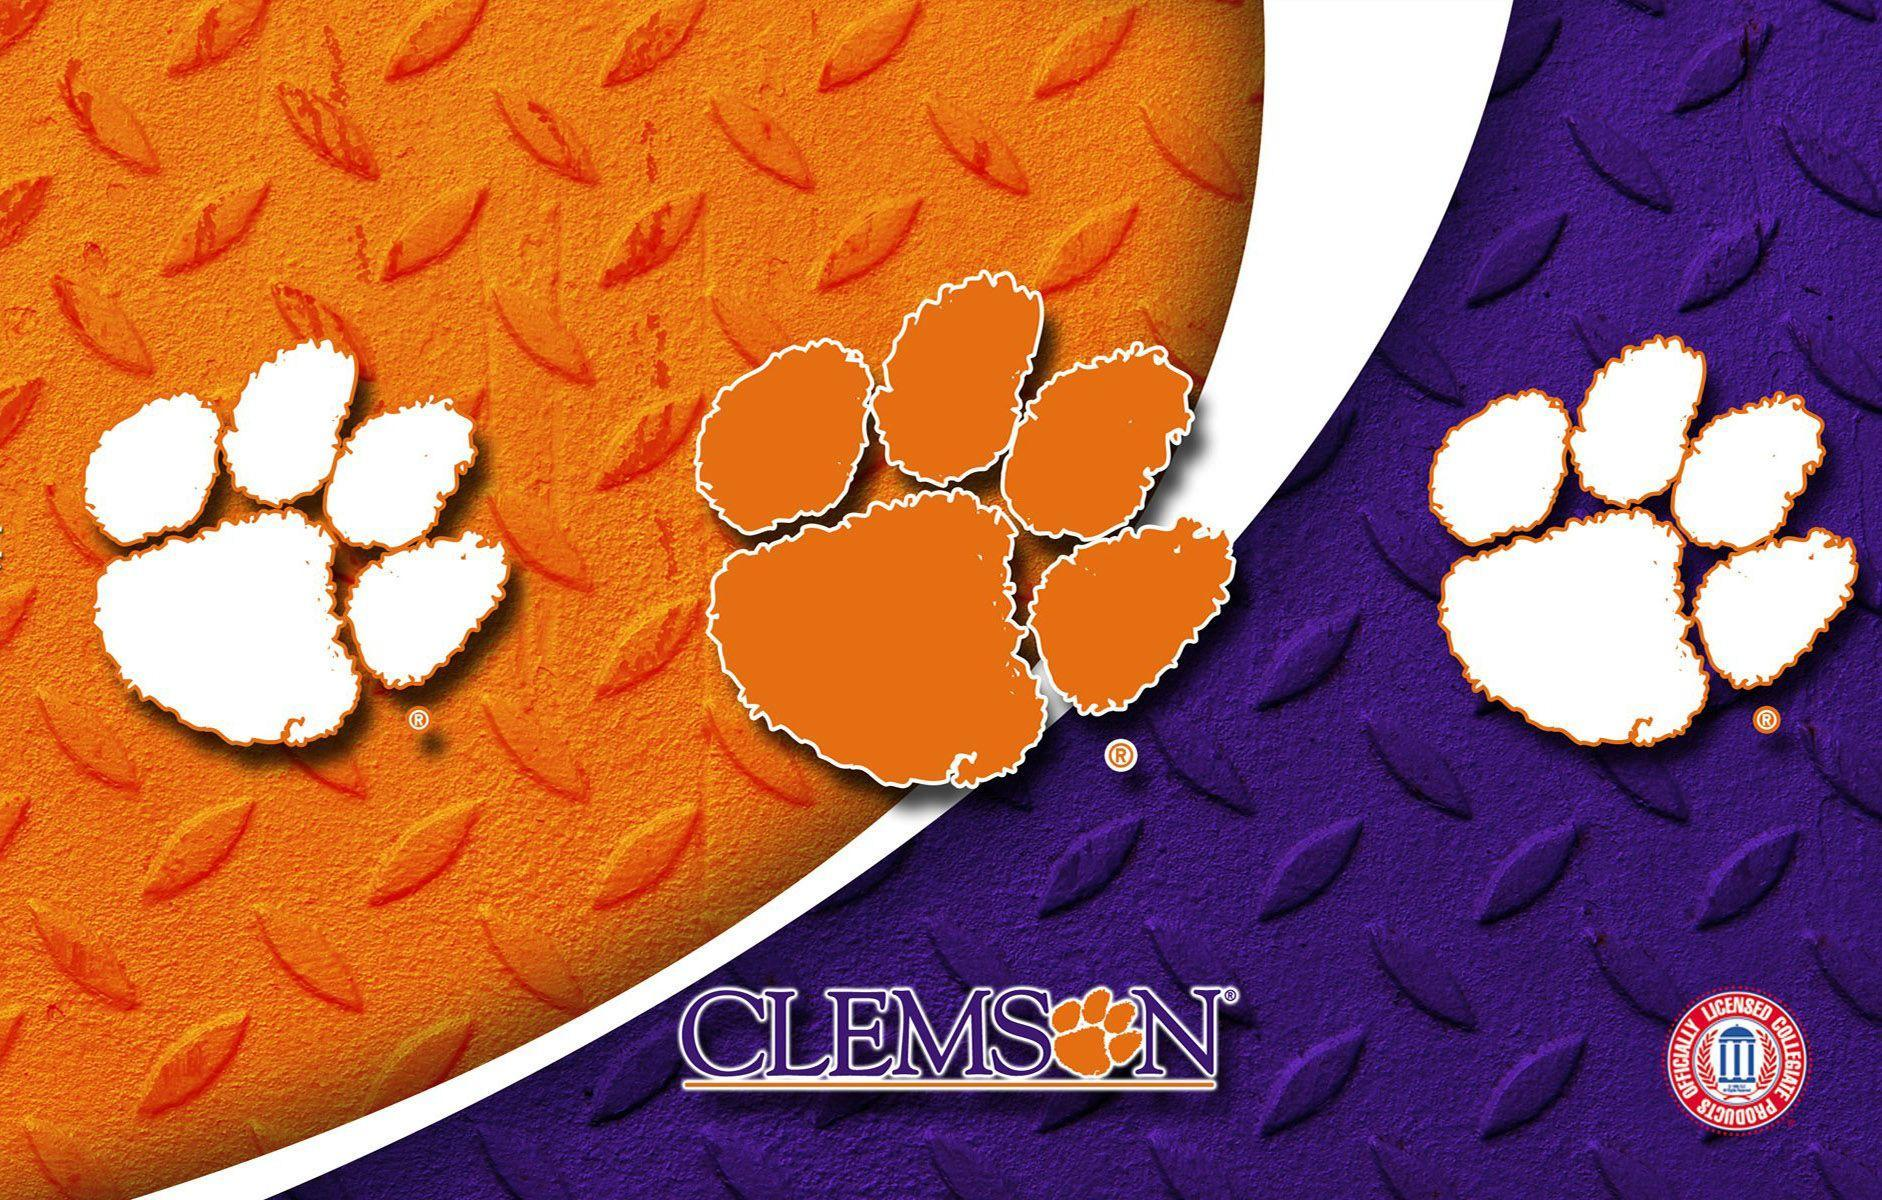 Clemson Tigers Wallpapers Wallpaper Cave